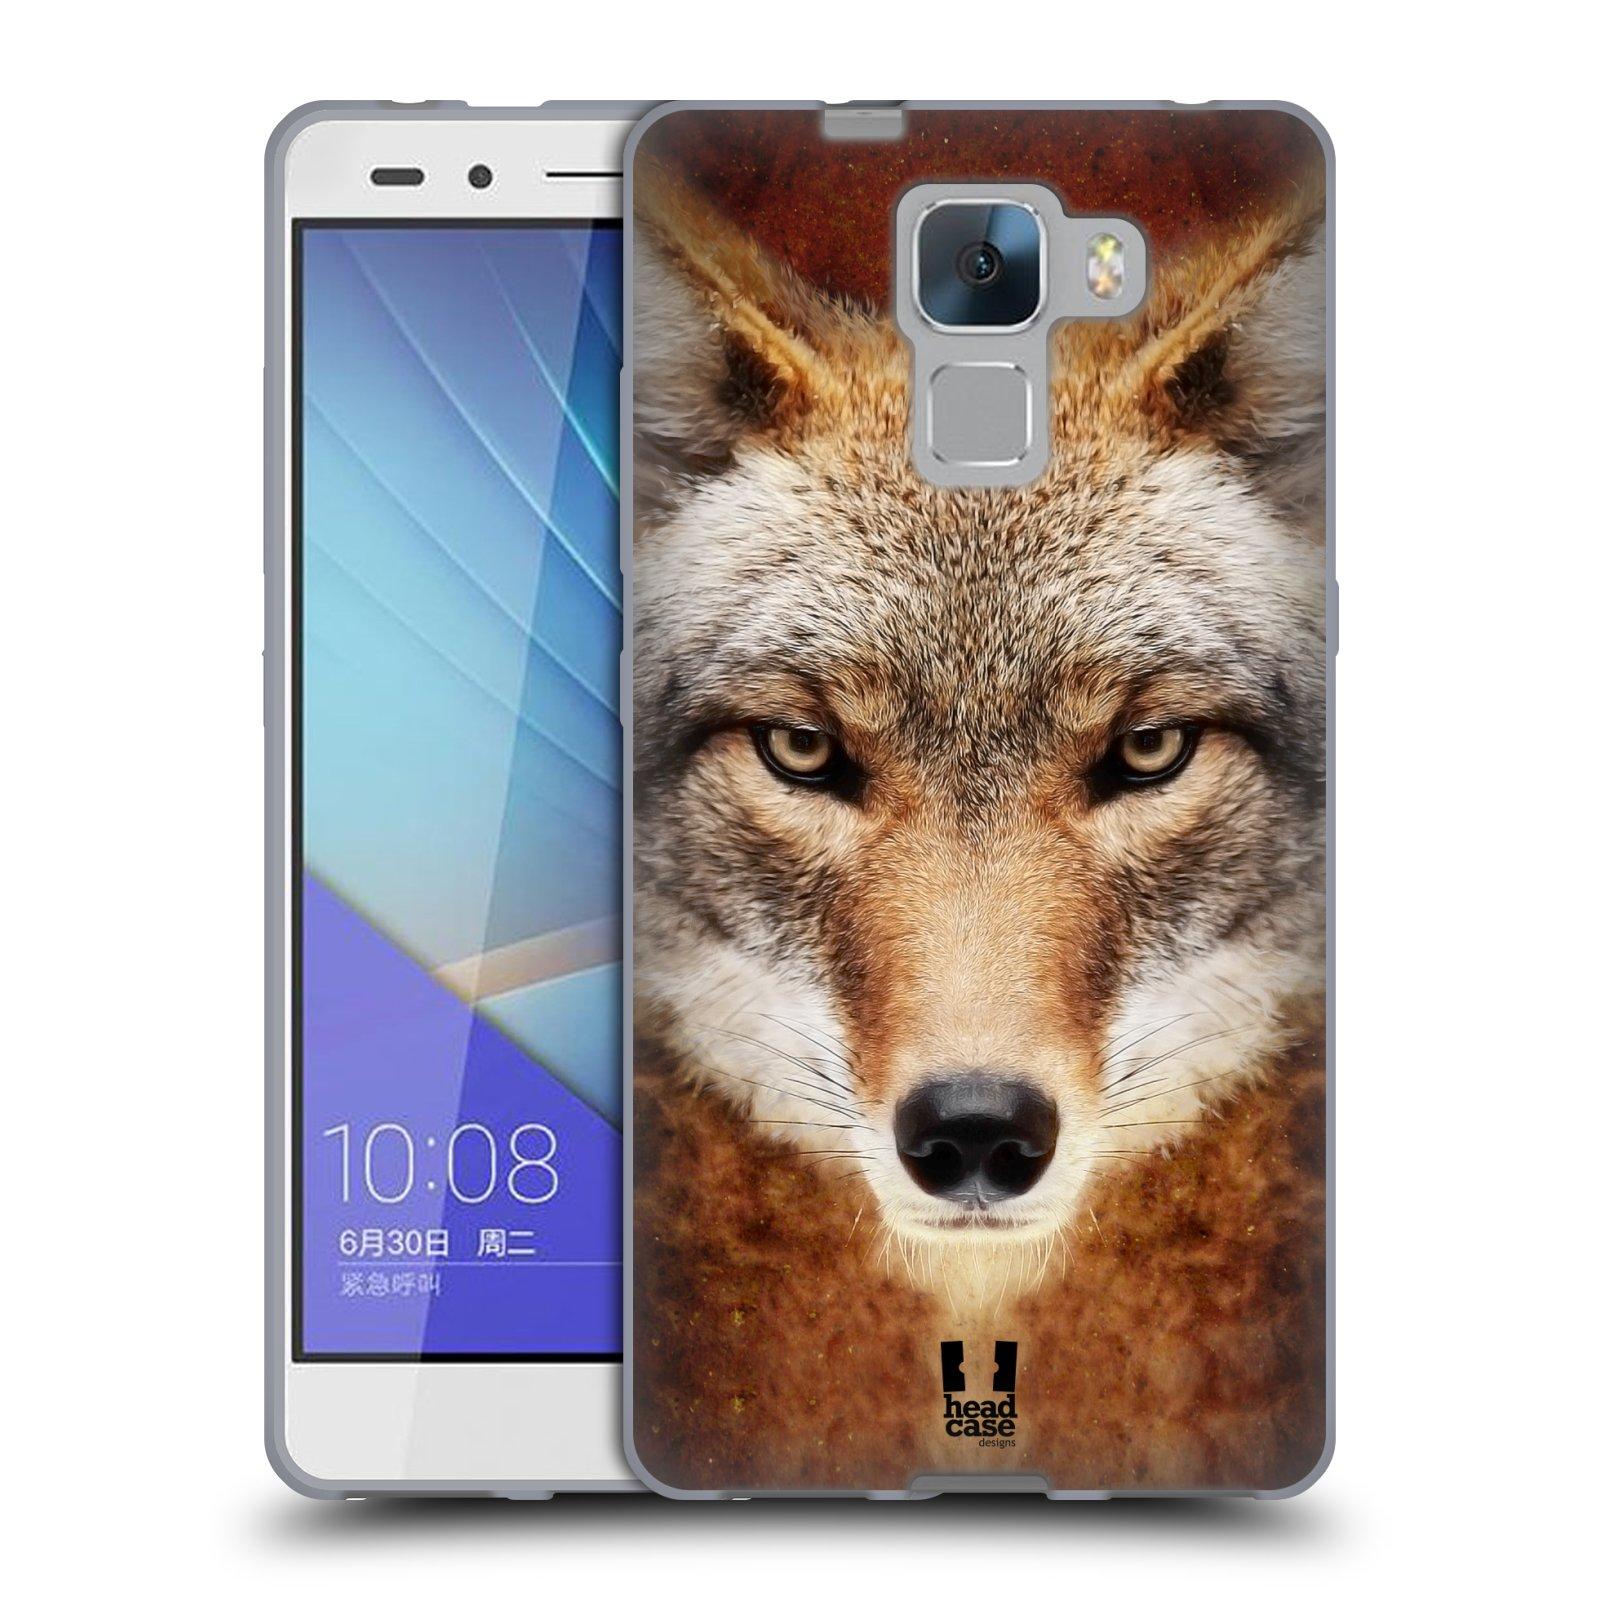 HEAD CASE silikonový obal na mobil HUAWEI HONOR 7 vzor Zvířecí tváře kojot